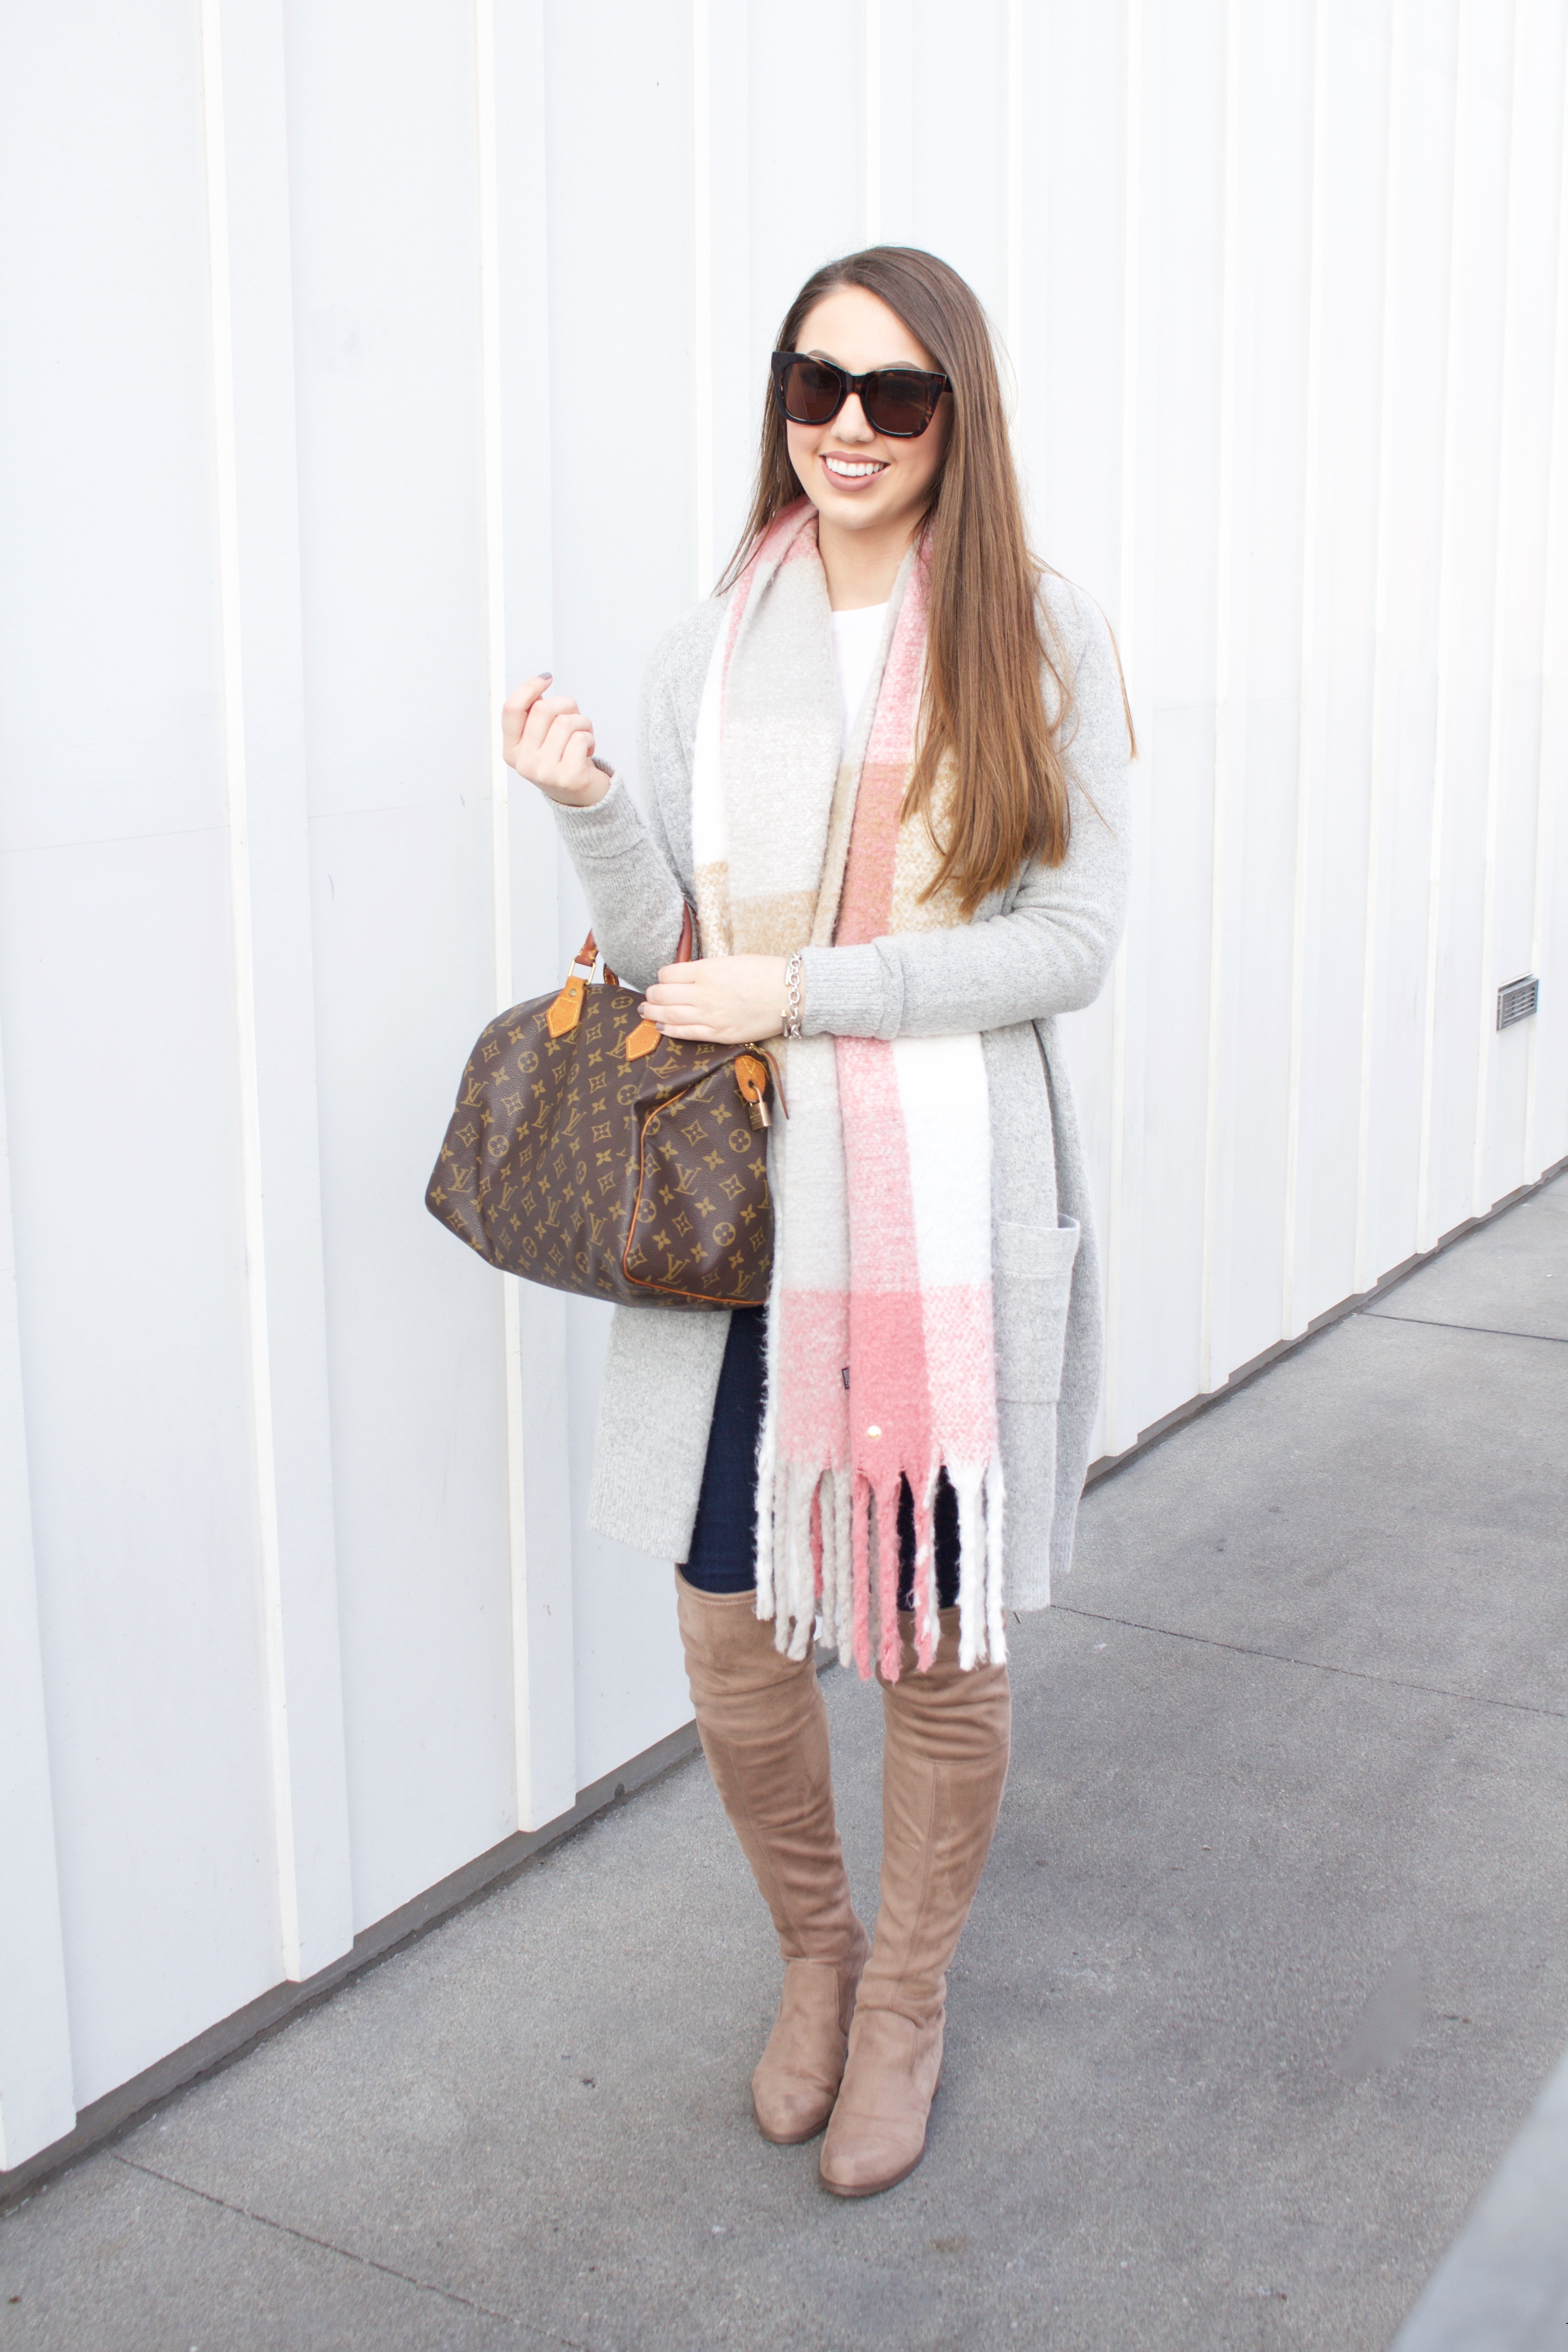 Express scarves